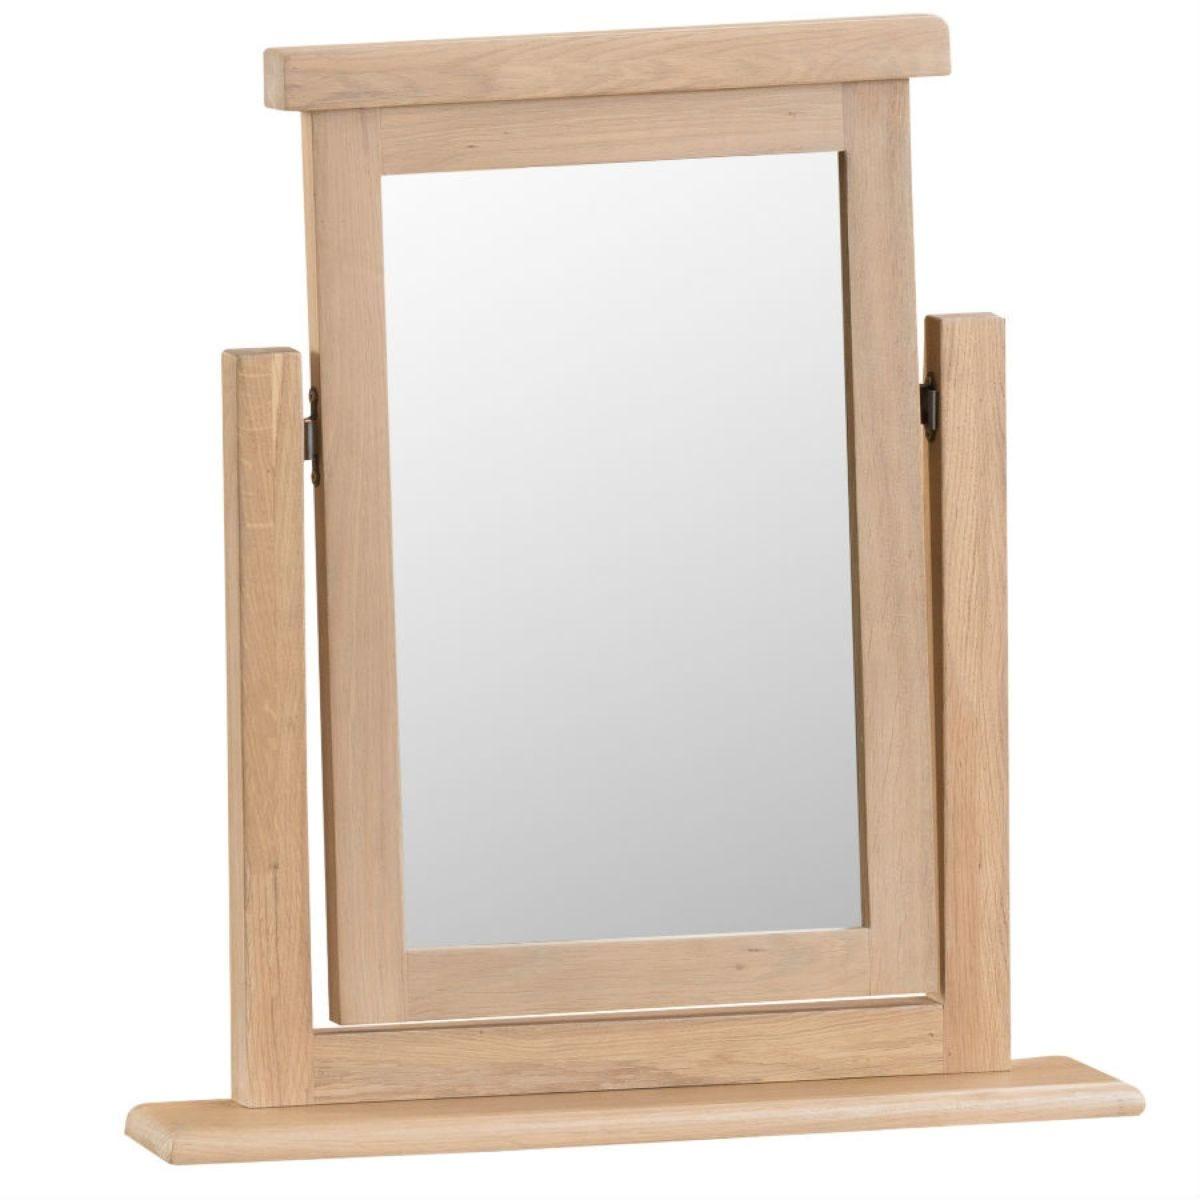 Wisborough Wooden Dressing Table Trinket Mirror